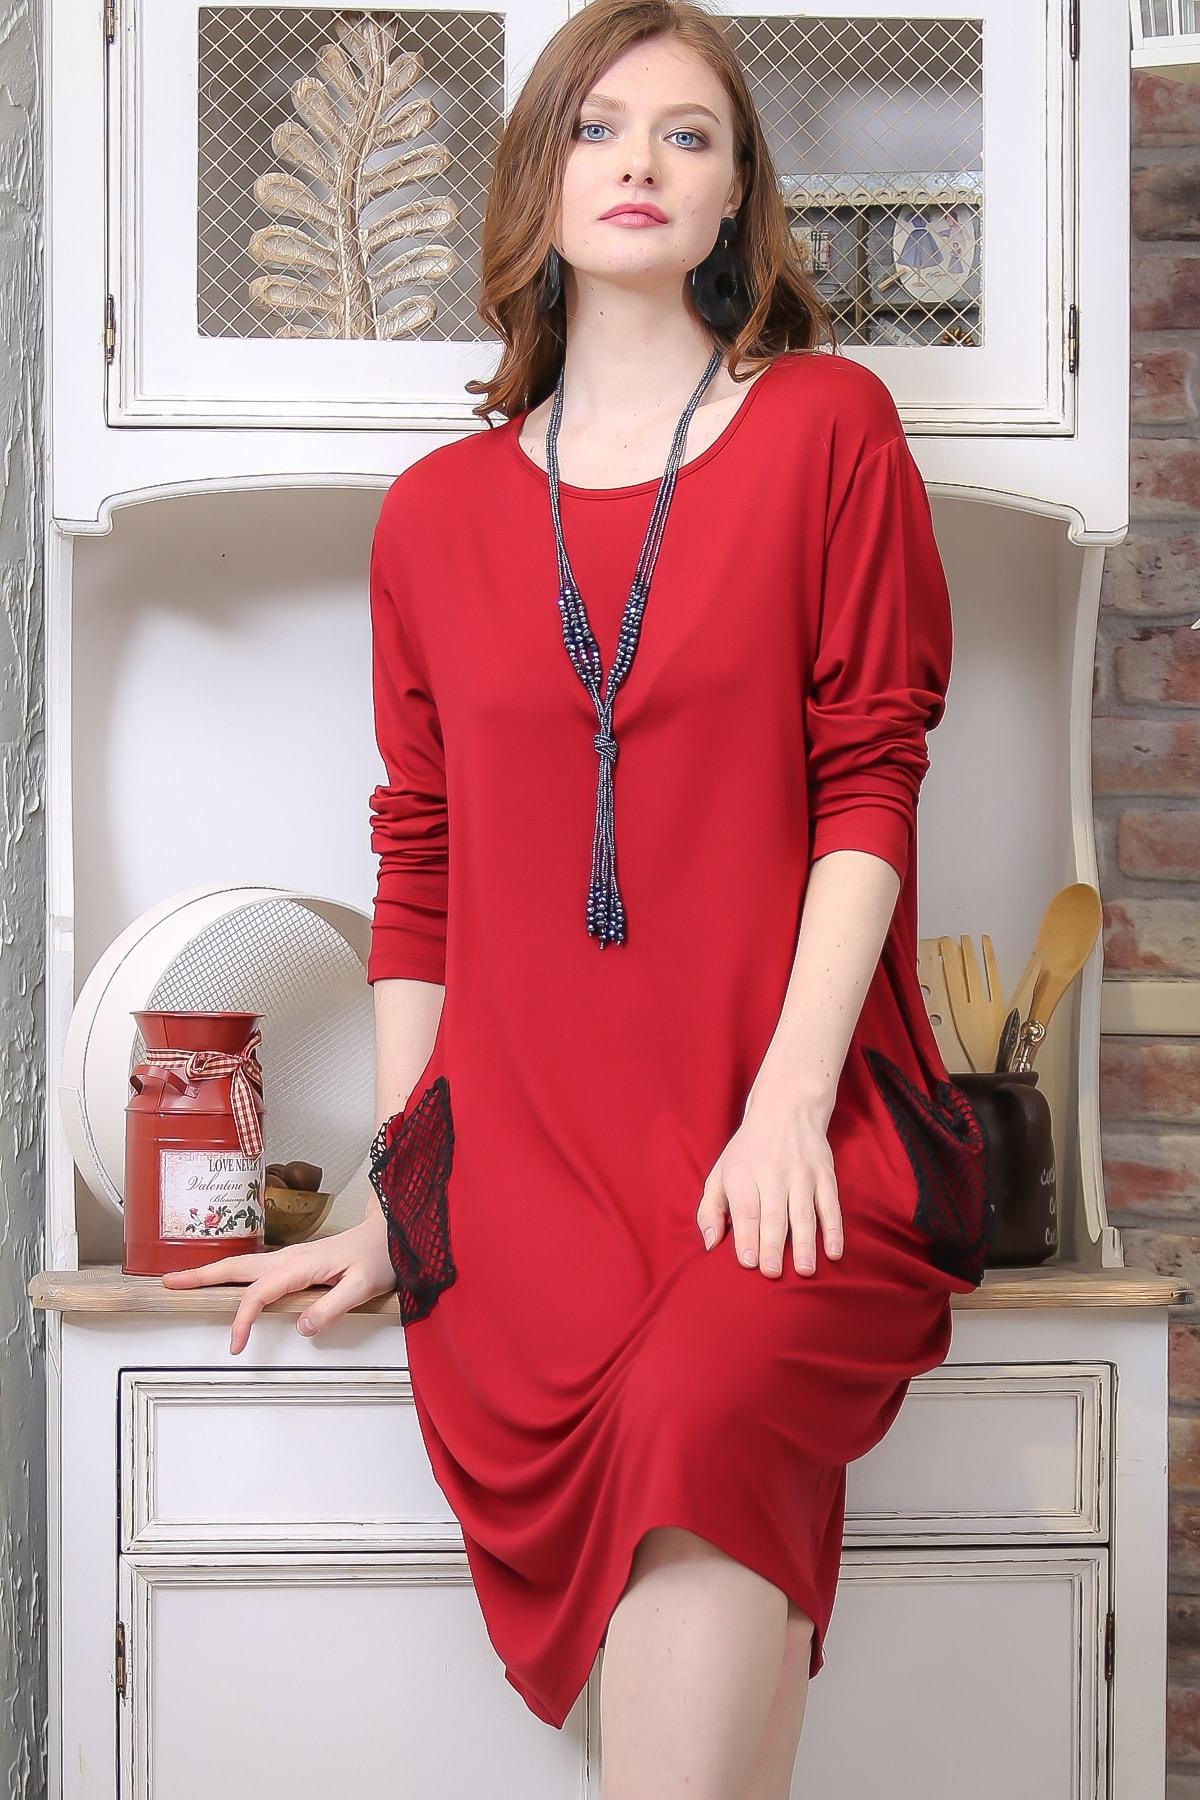 Chiccy Kadın Kırmızı Retro File Cep Detaylı Salaş Elbise M10160000EL97335